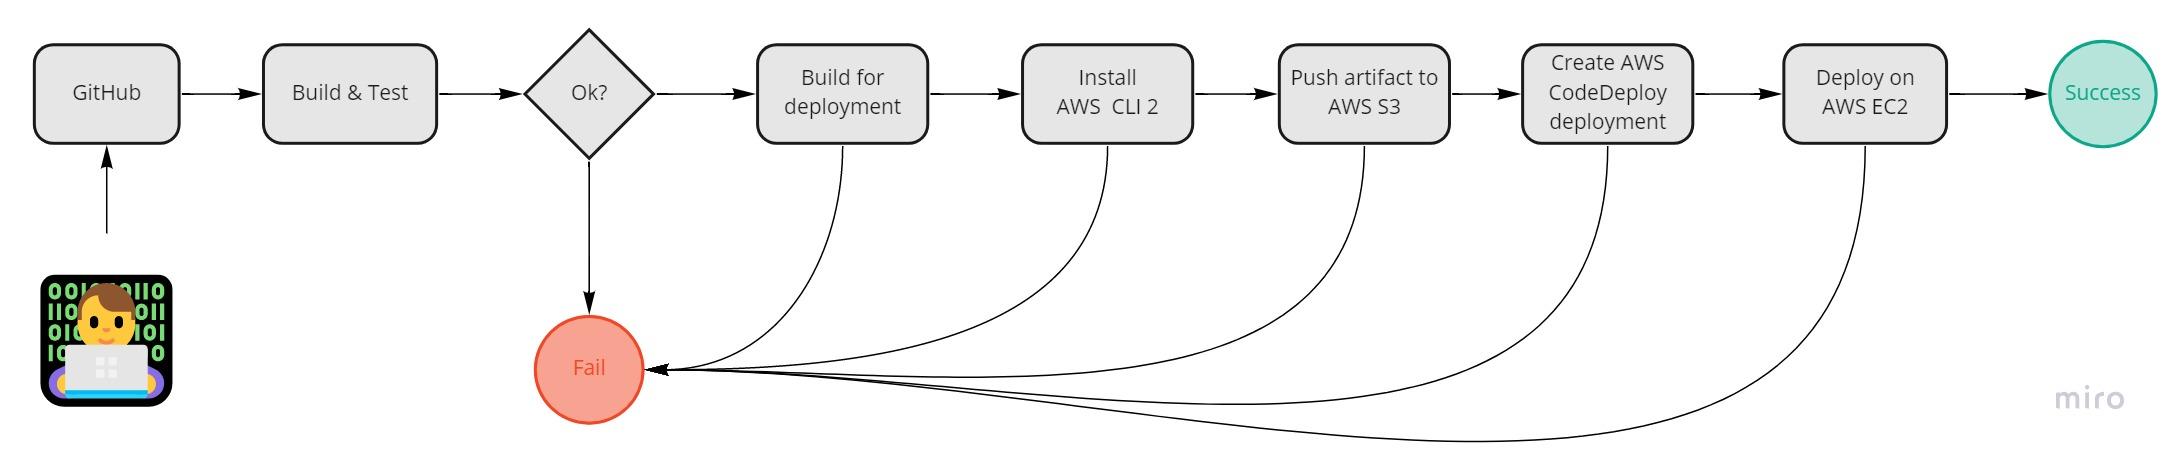 CICD для проекта в GitHub с развертыванием на AWSEC2